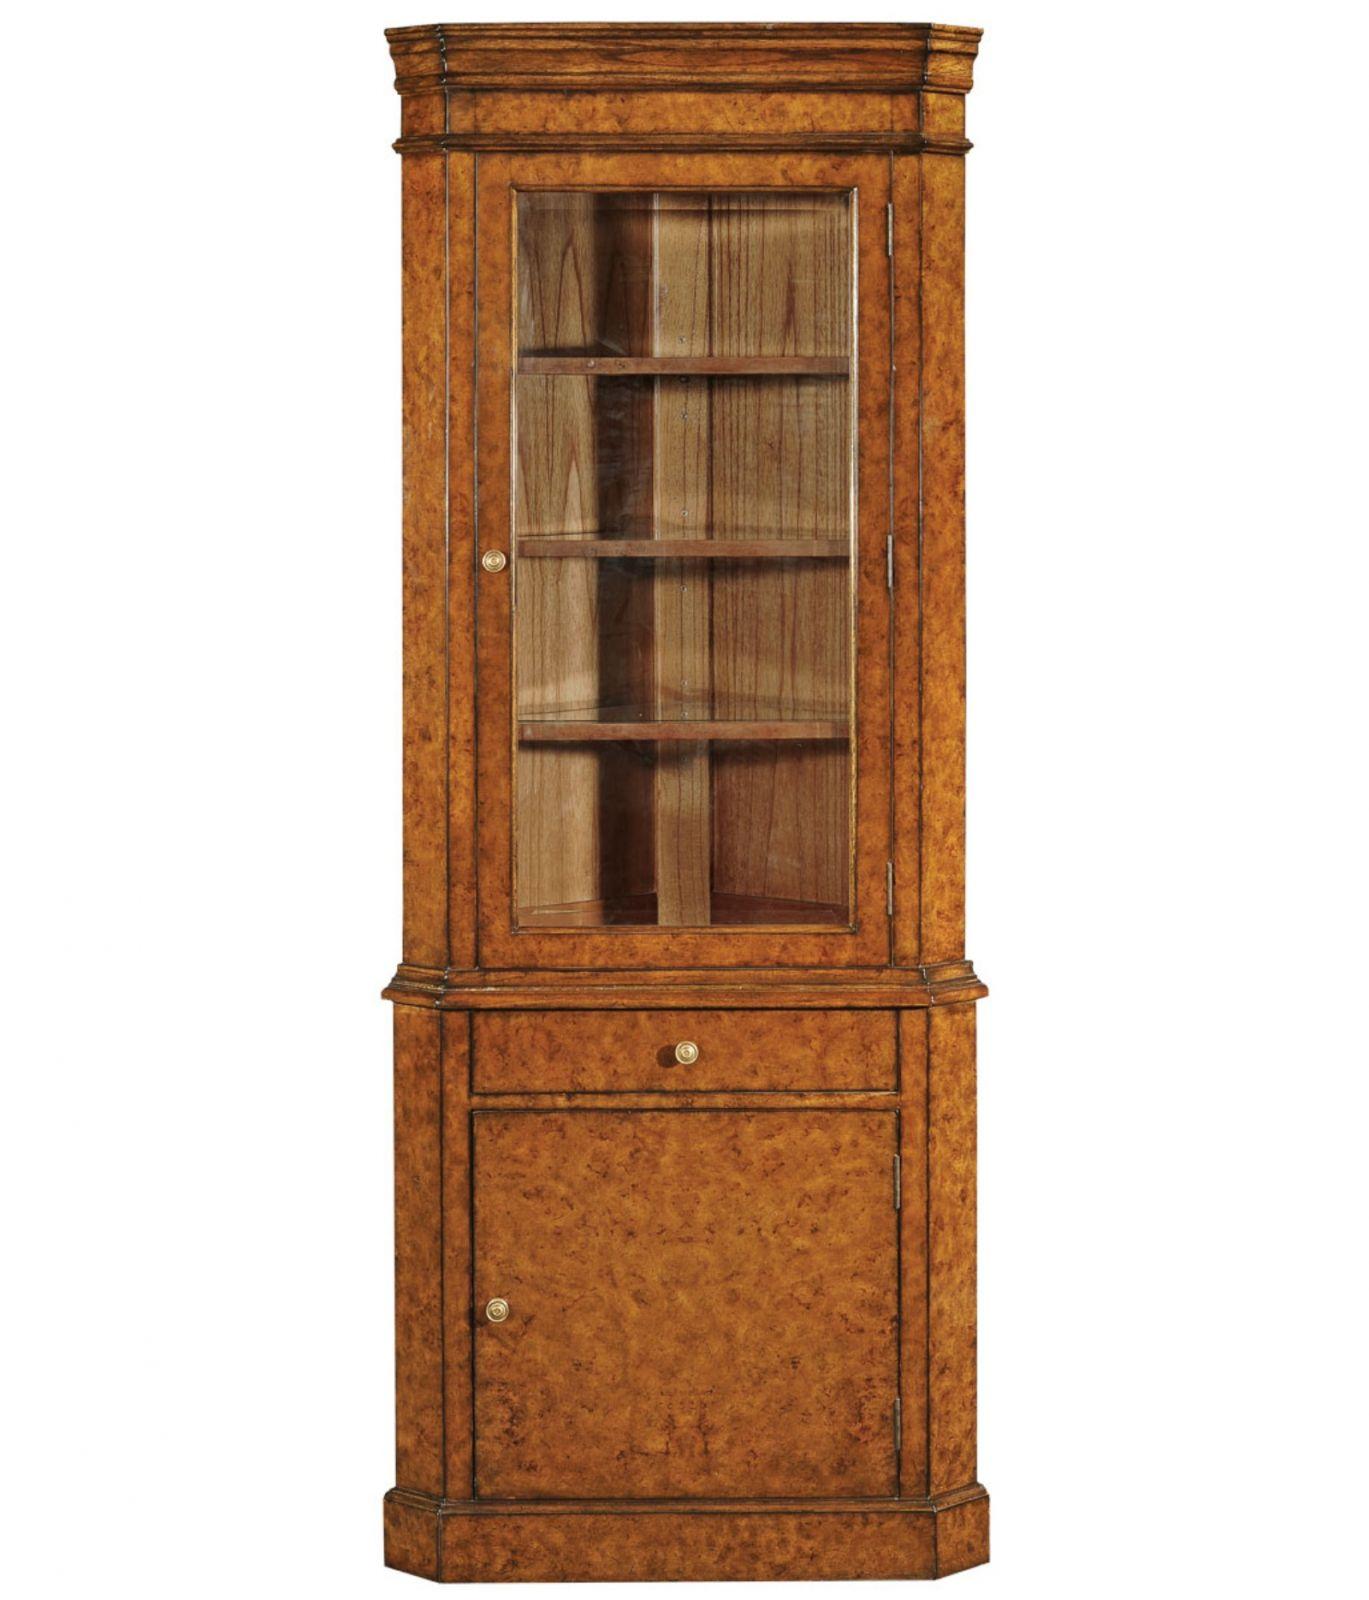 Dorchester corner cabinet